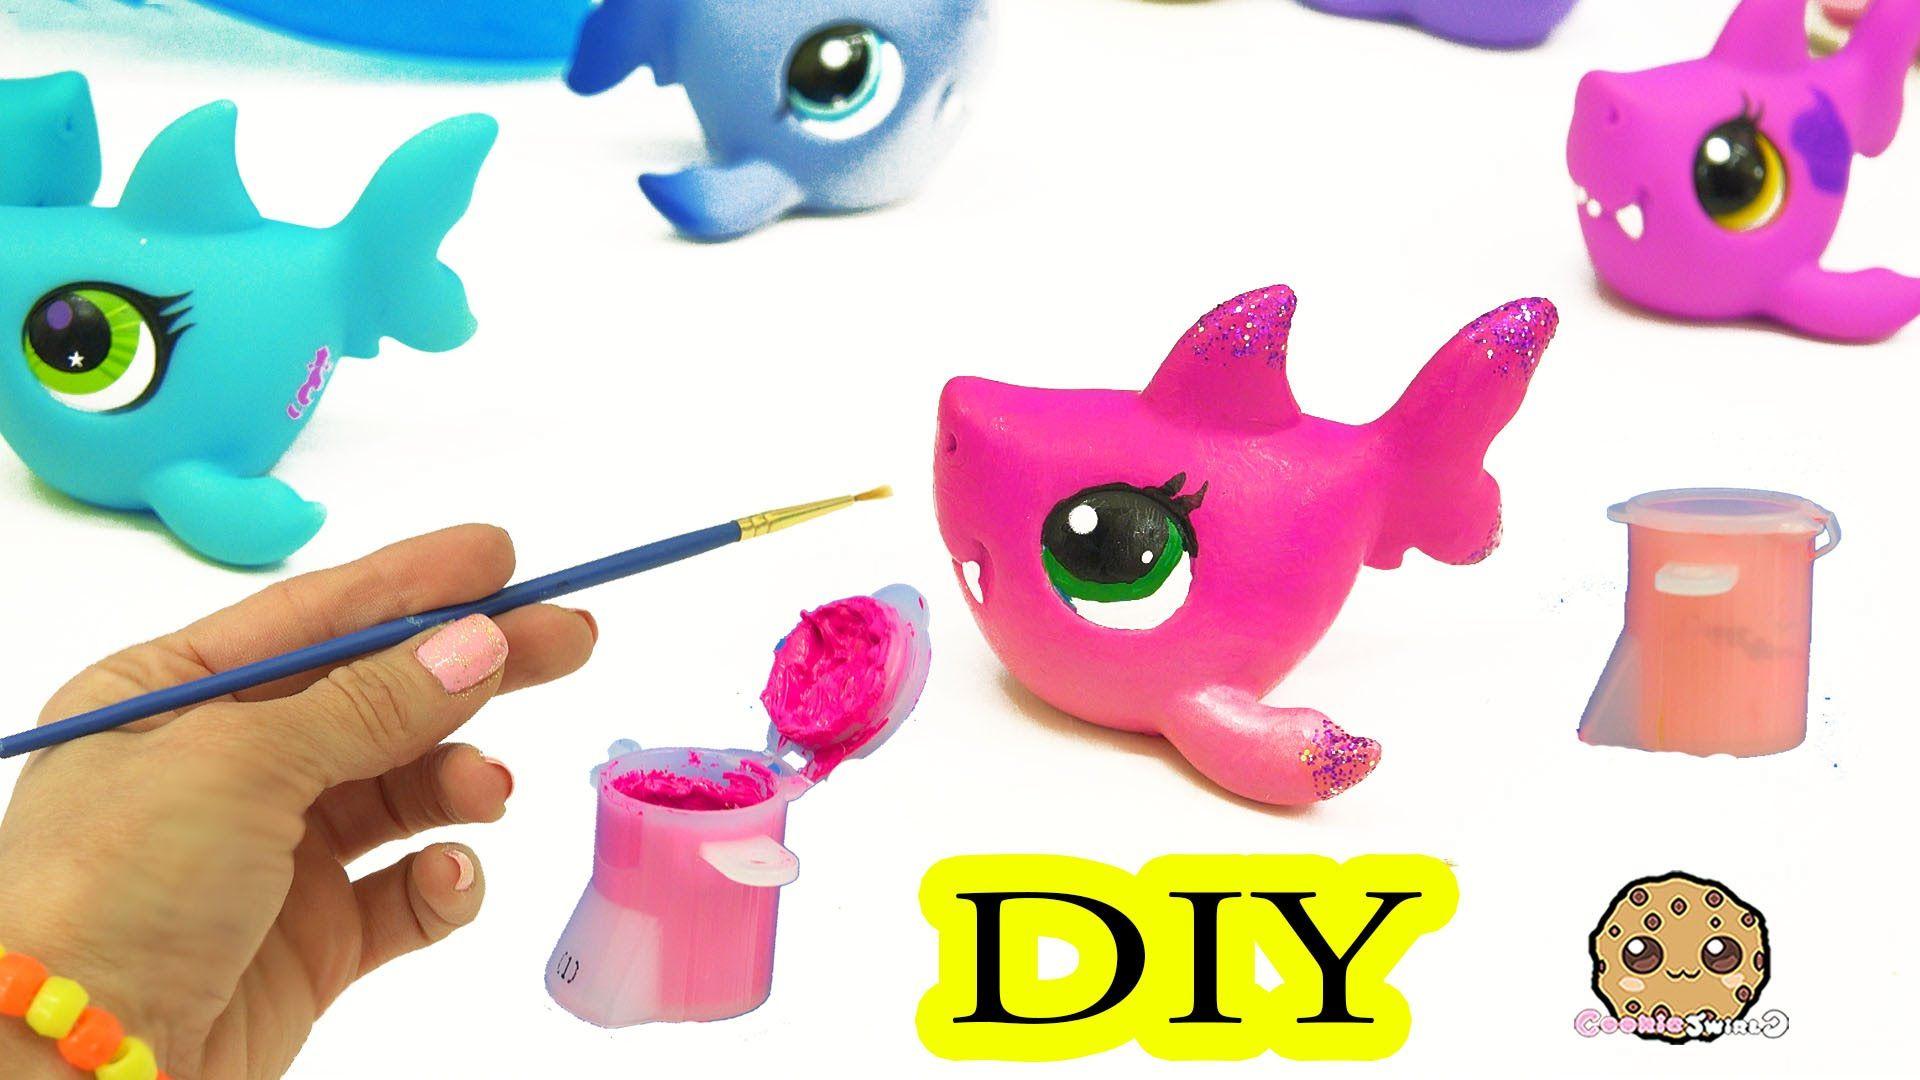 Custom painting diy littlest pet shop shark lps do it yourself custom painting diy littlest pet shop shark lps do it yourself cookies solutioingenieria Gallery